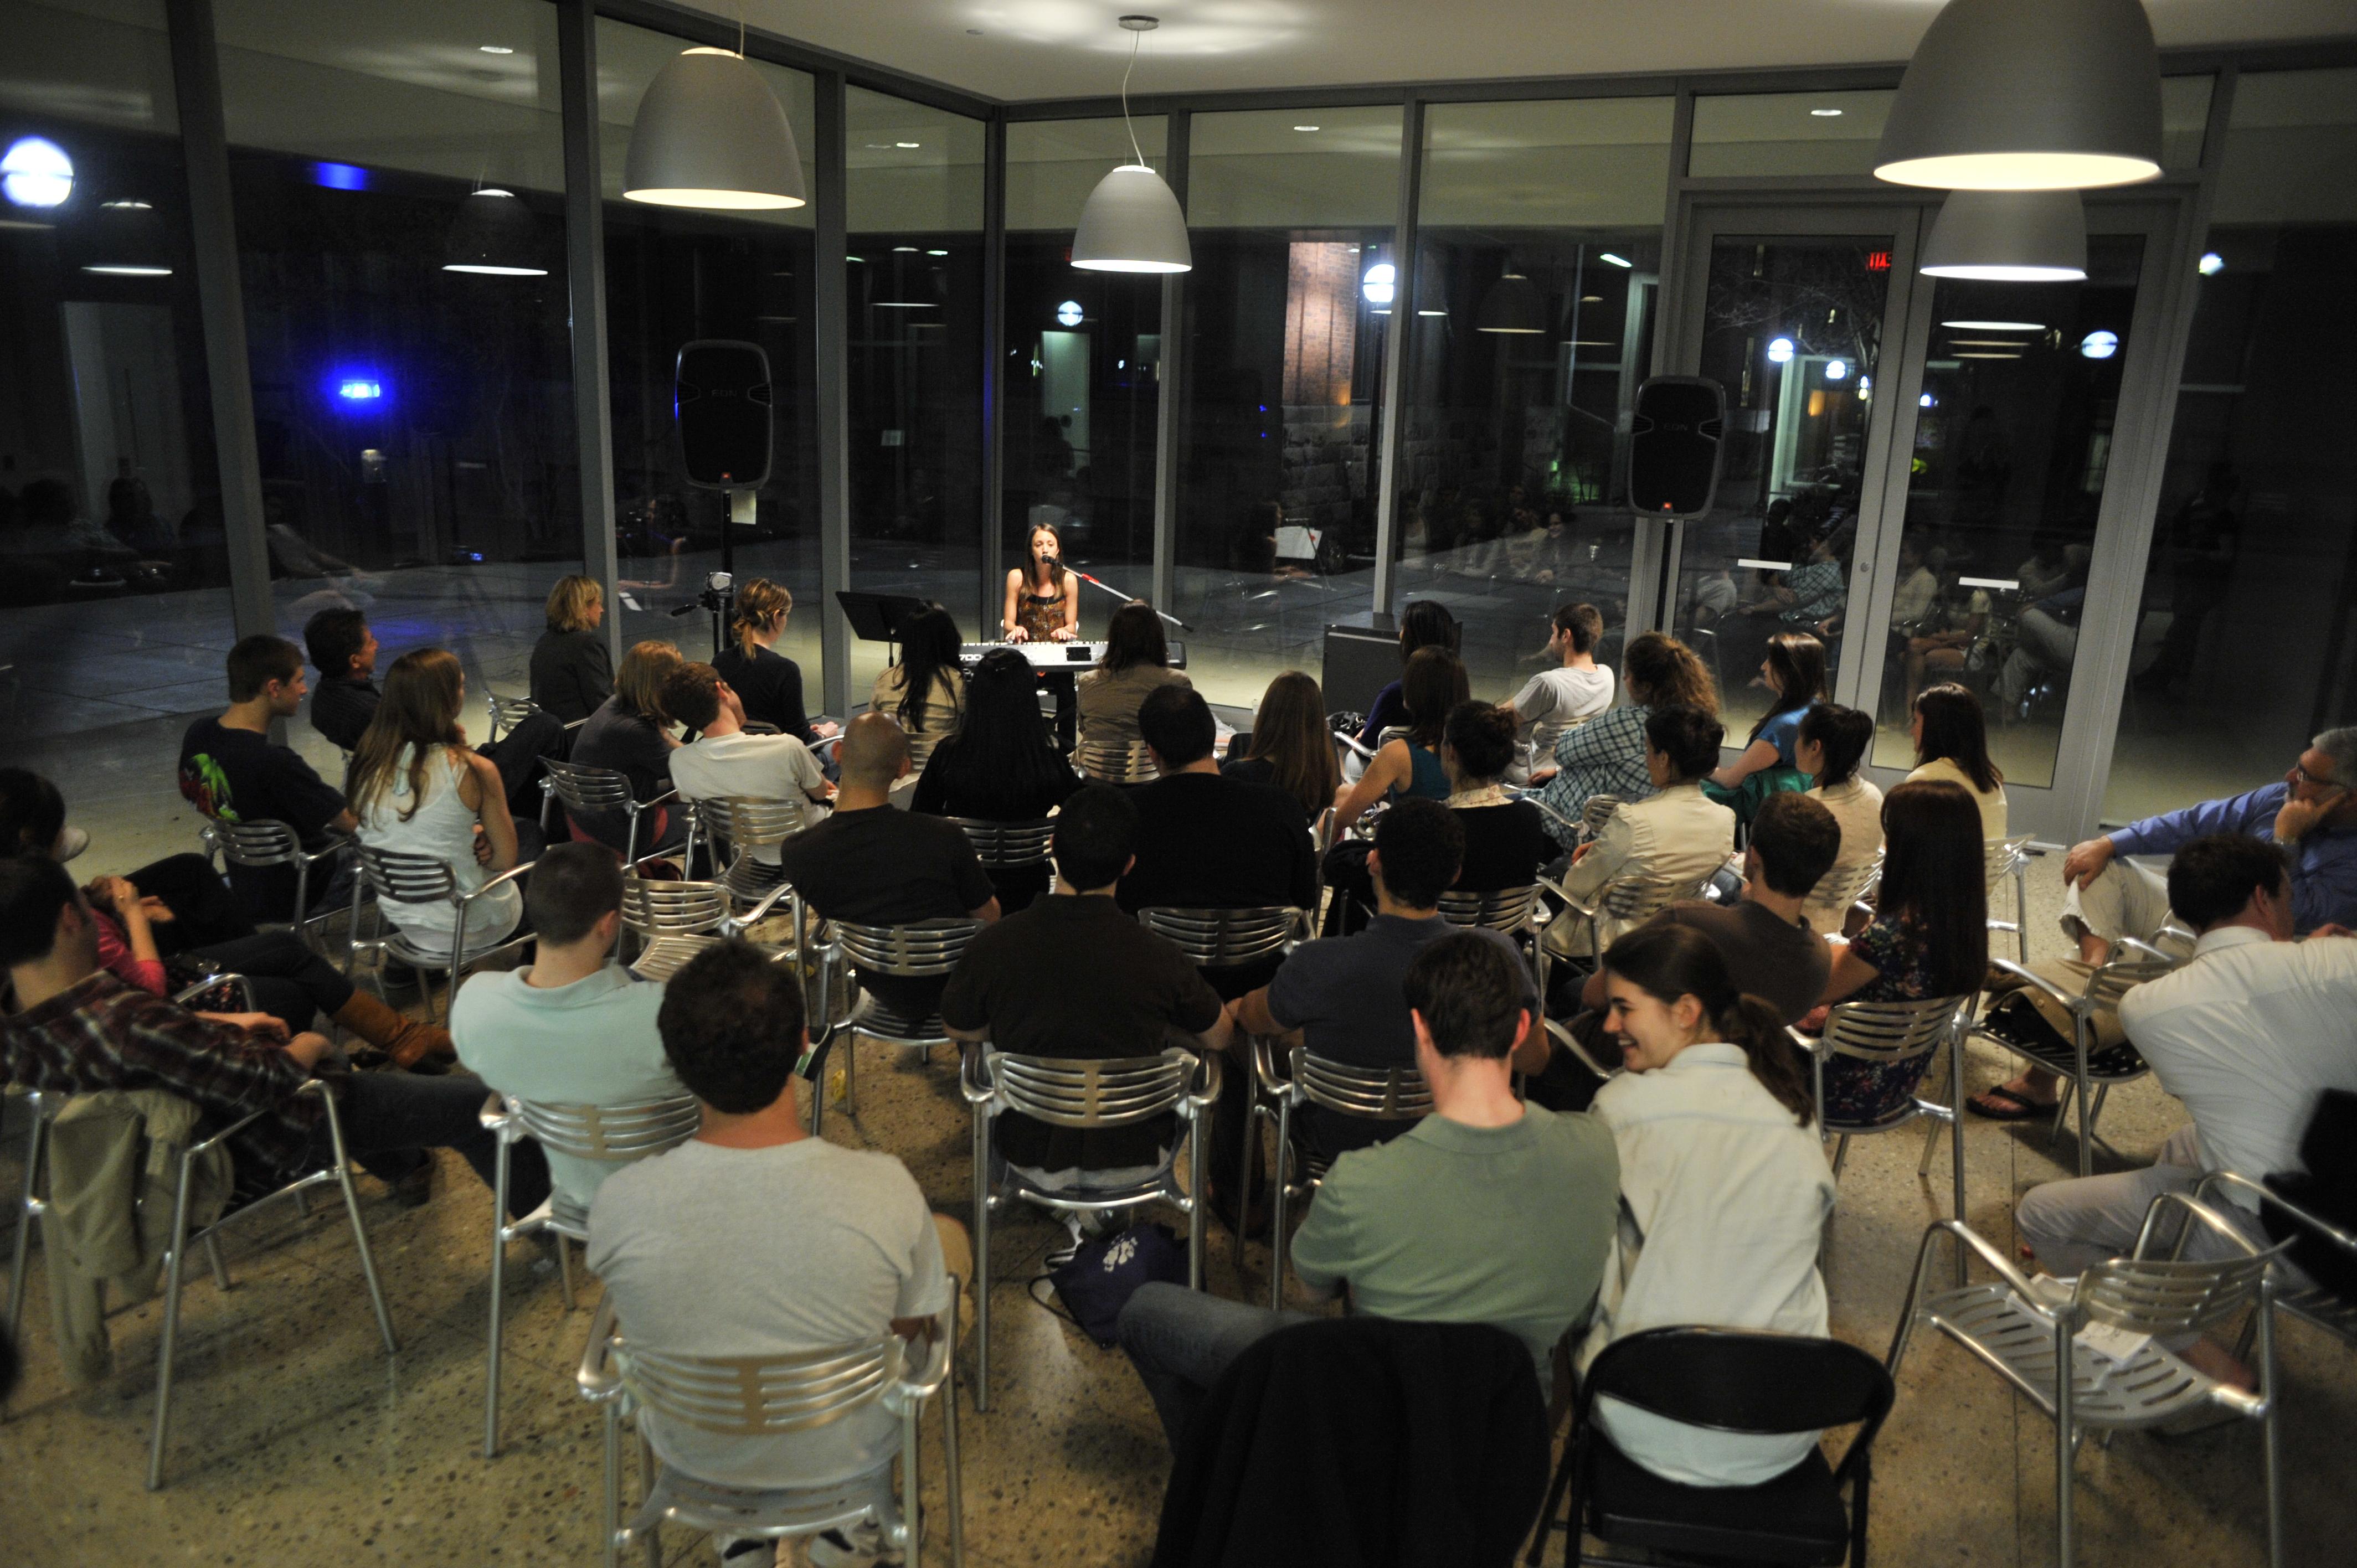 Student Group Rentals at UMMA